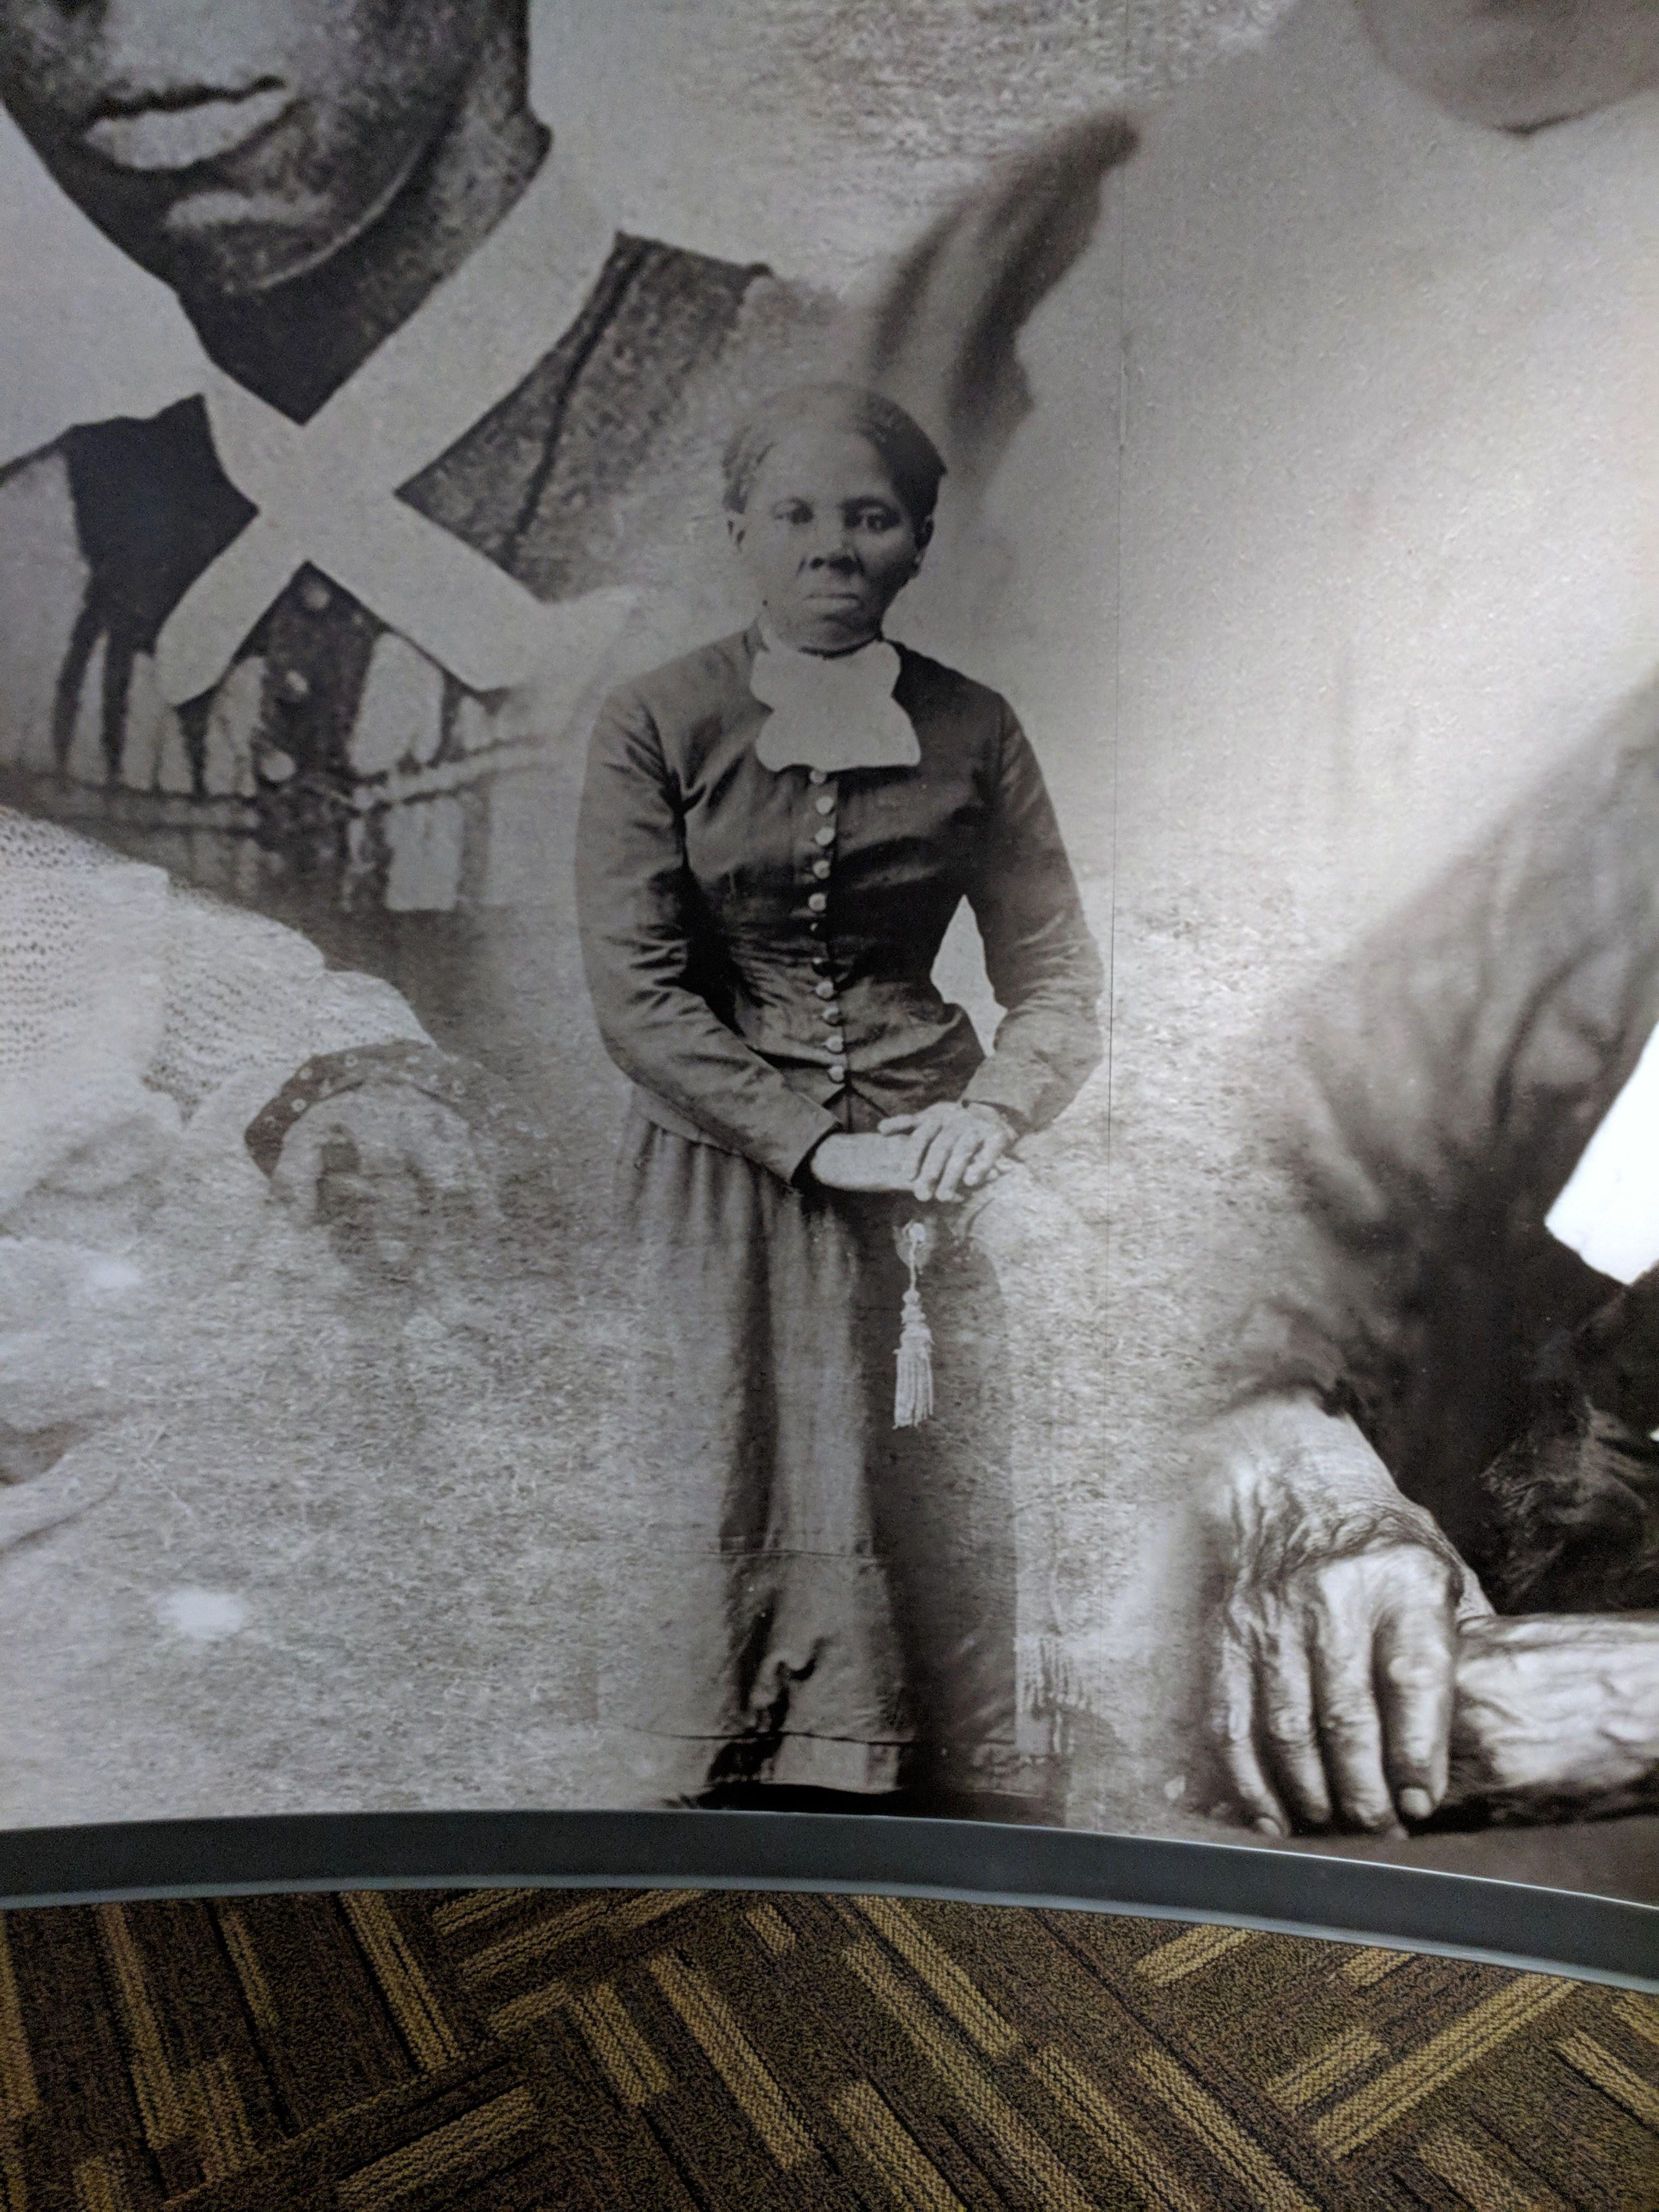 File:Harriet Tubman Underground Railroad Visitor Center Dorchester County 32.jpg - Wikimedia Commons